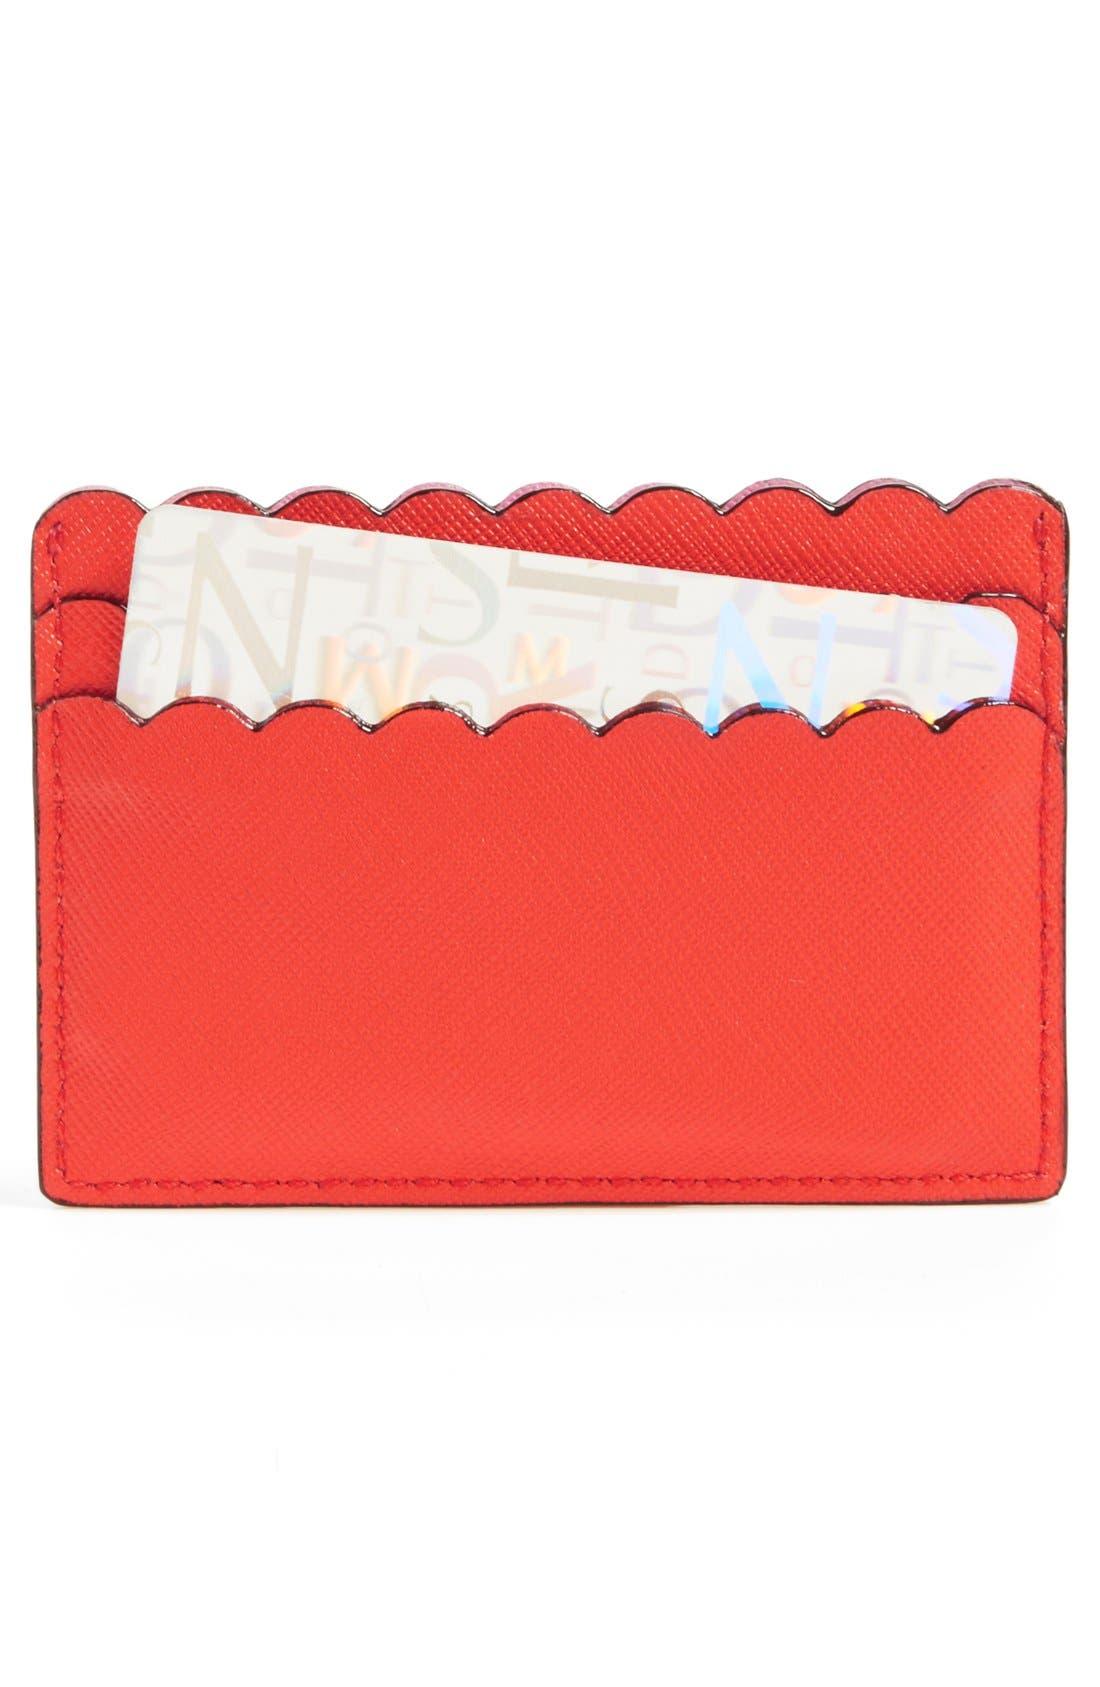 Alternate Image 2  - kate spade new york 'cape drive' saffiano leather card holder